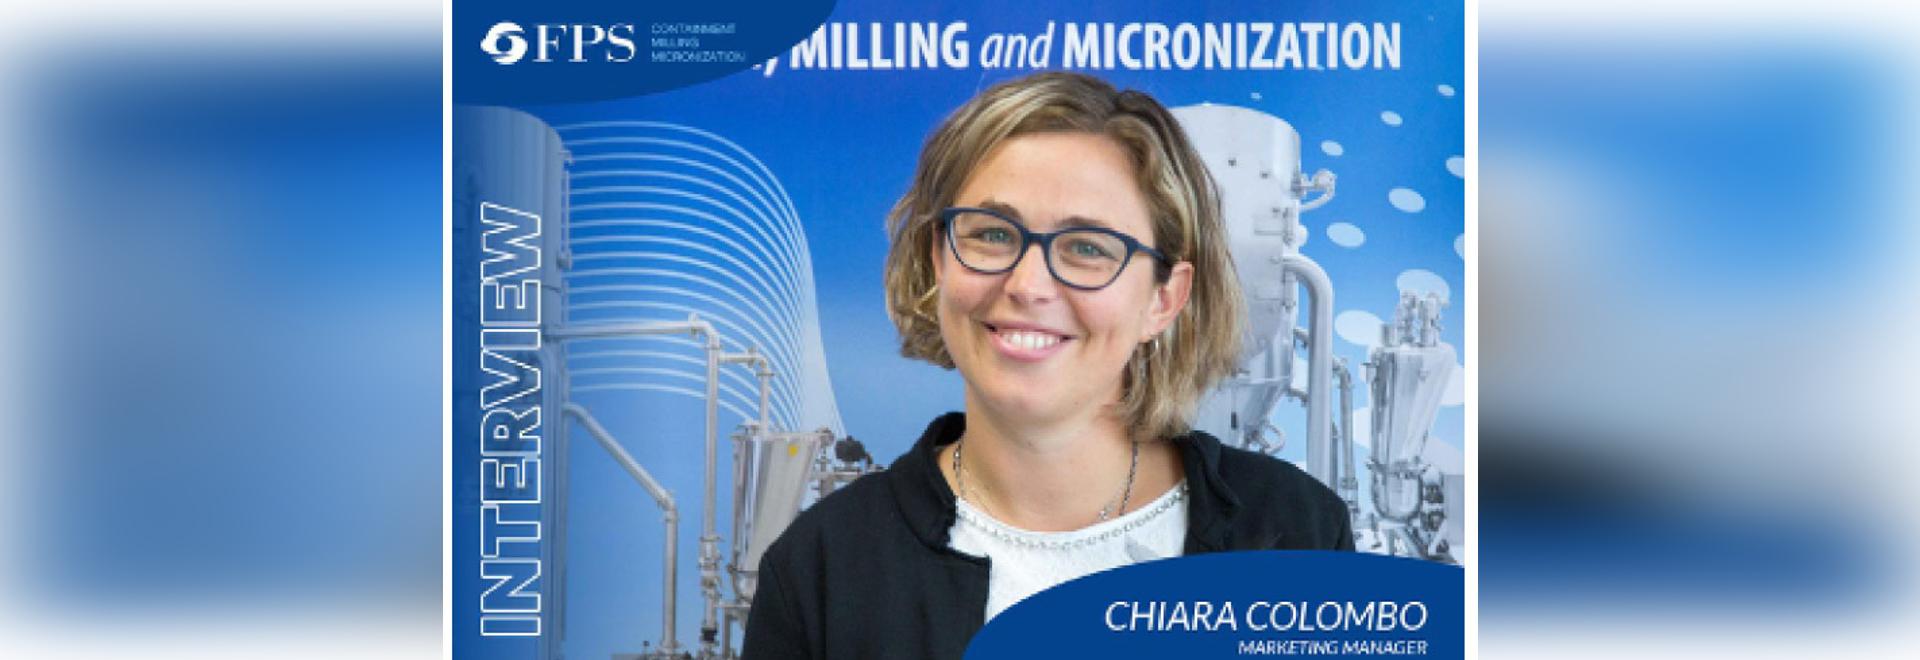 Sra. Chiara Colombo - Gerente de Marketing de FPS